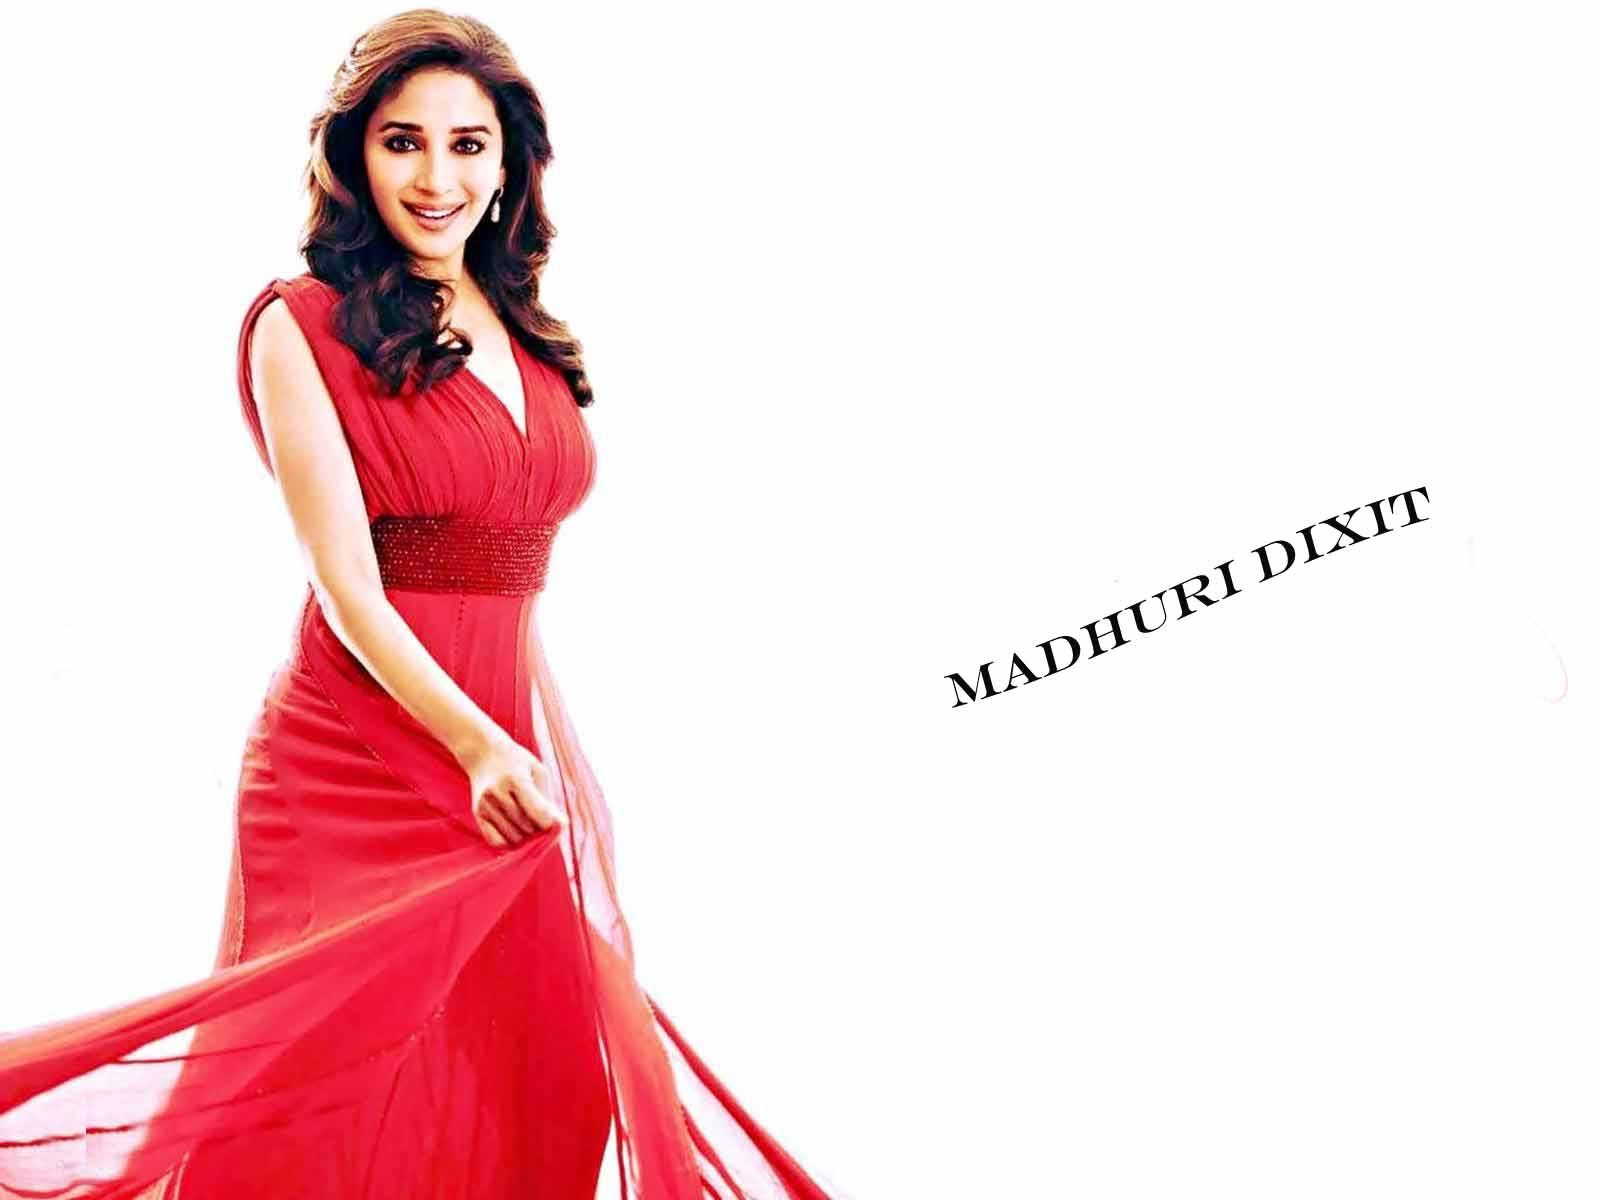 Madhuri Dixit Photo Hd